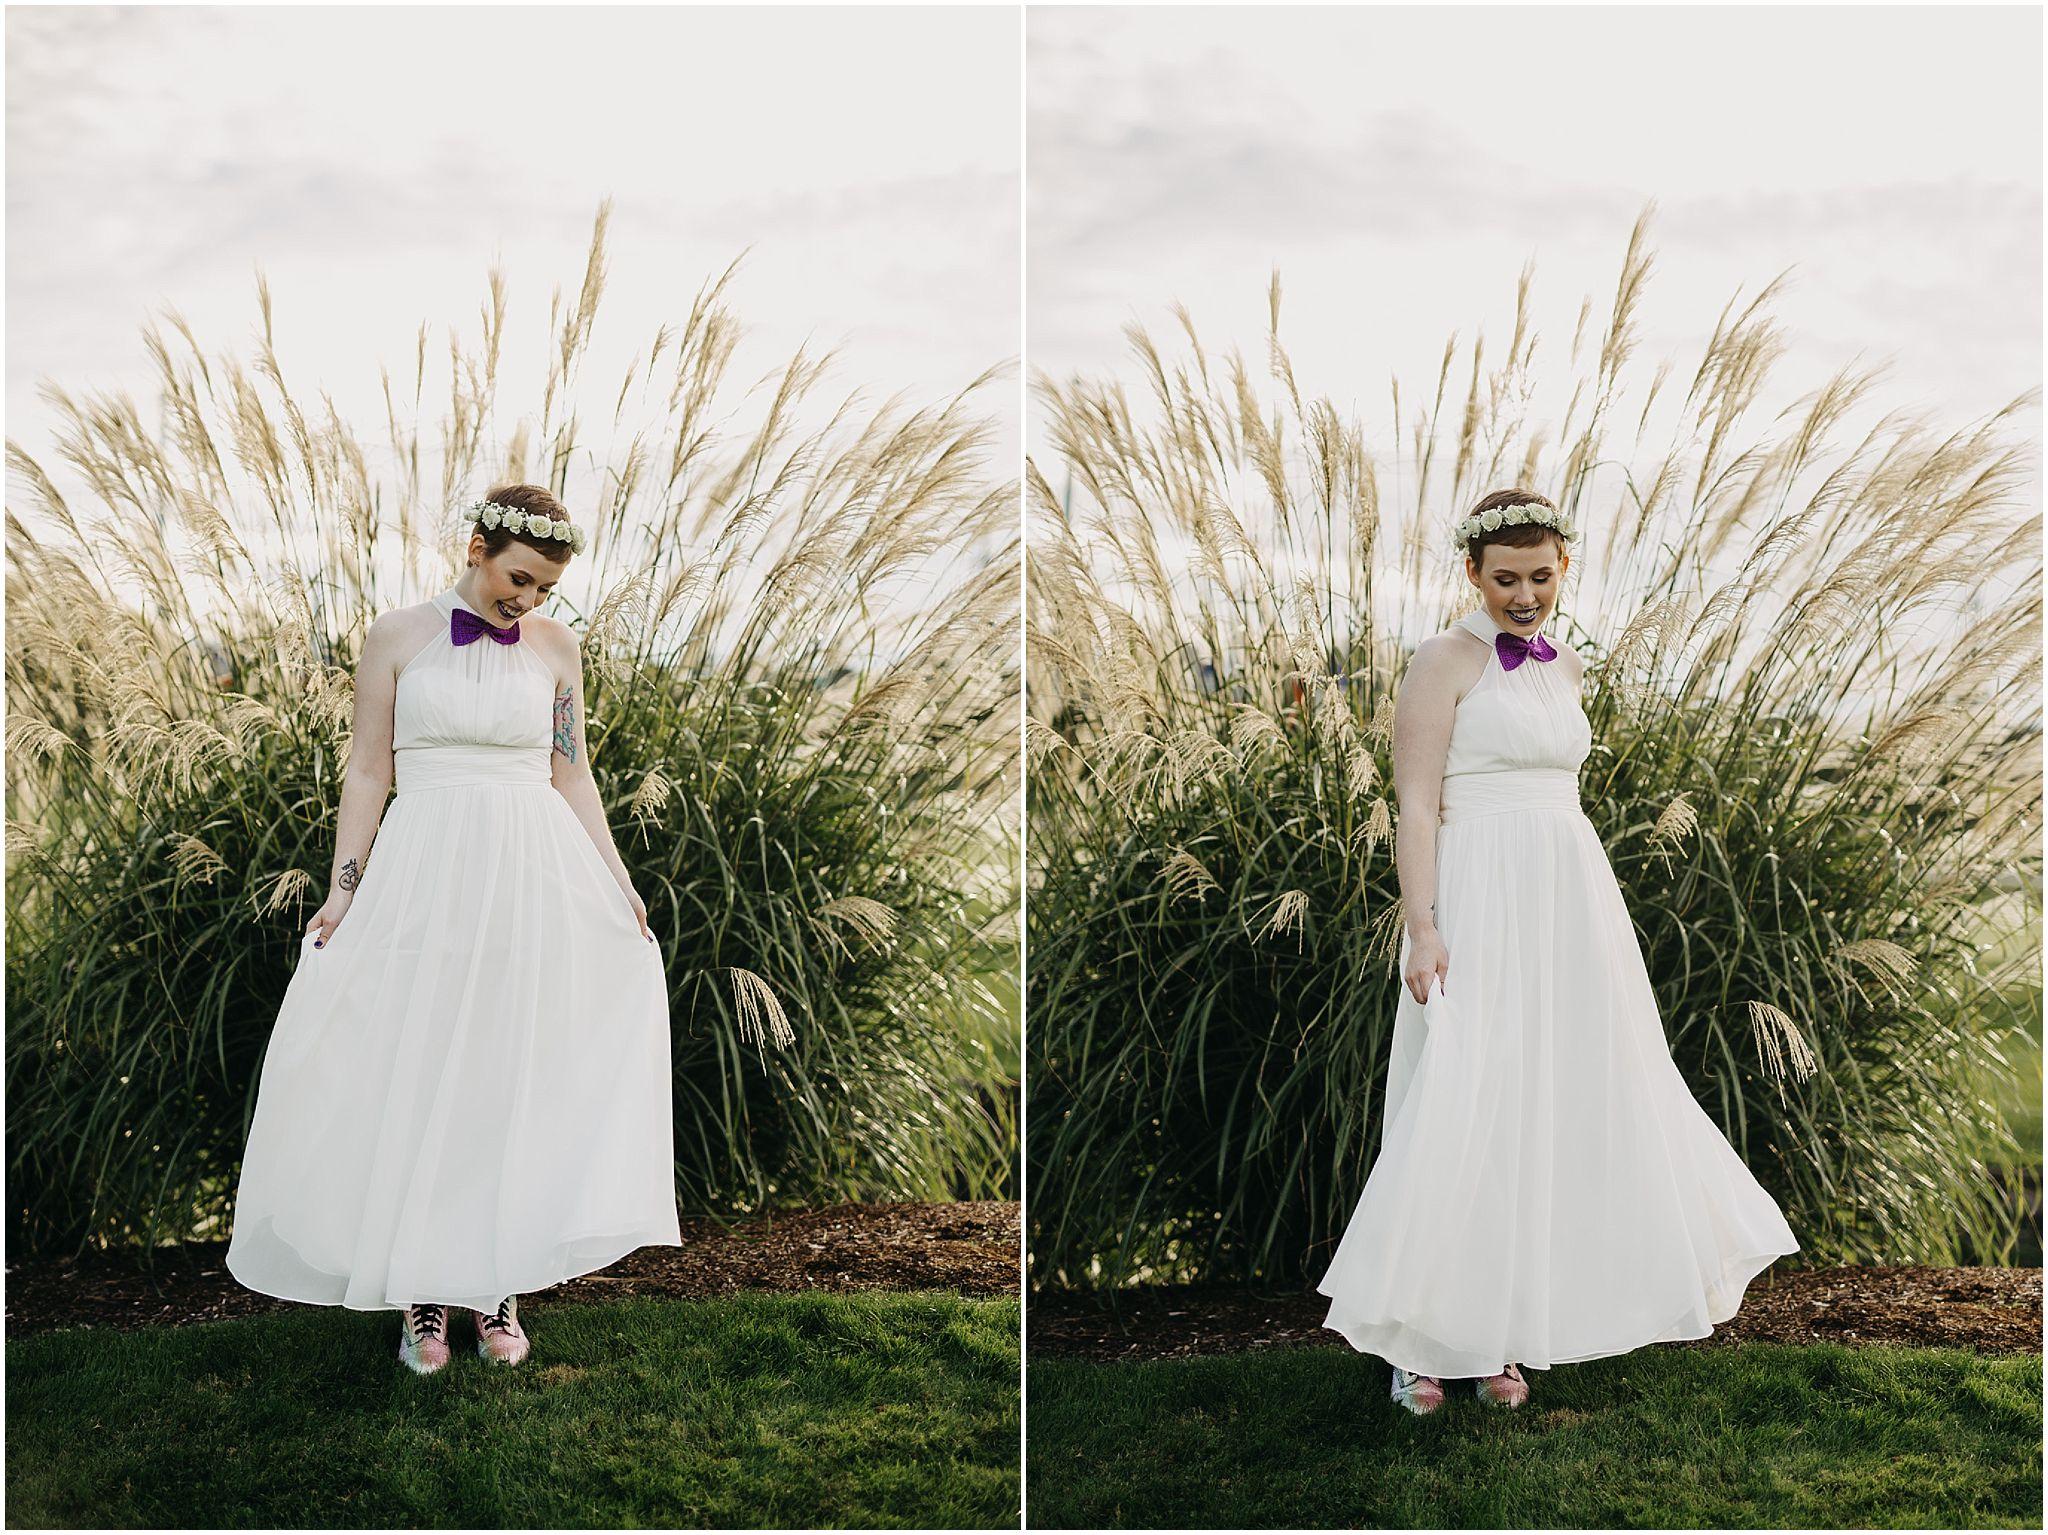 bride spinning wedding dress outdoor pitt meadows wedding